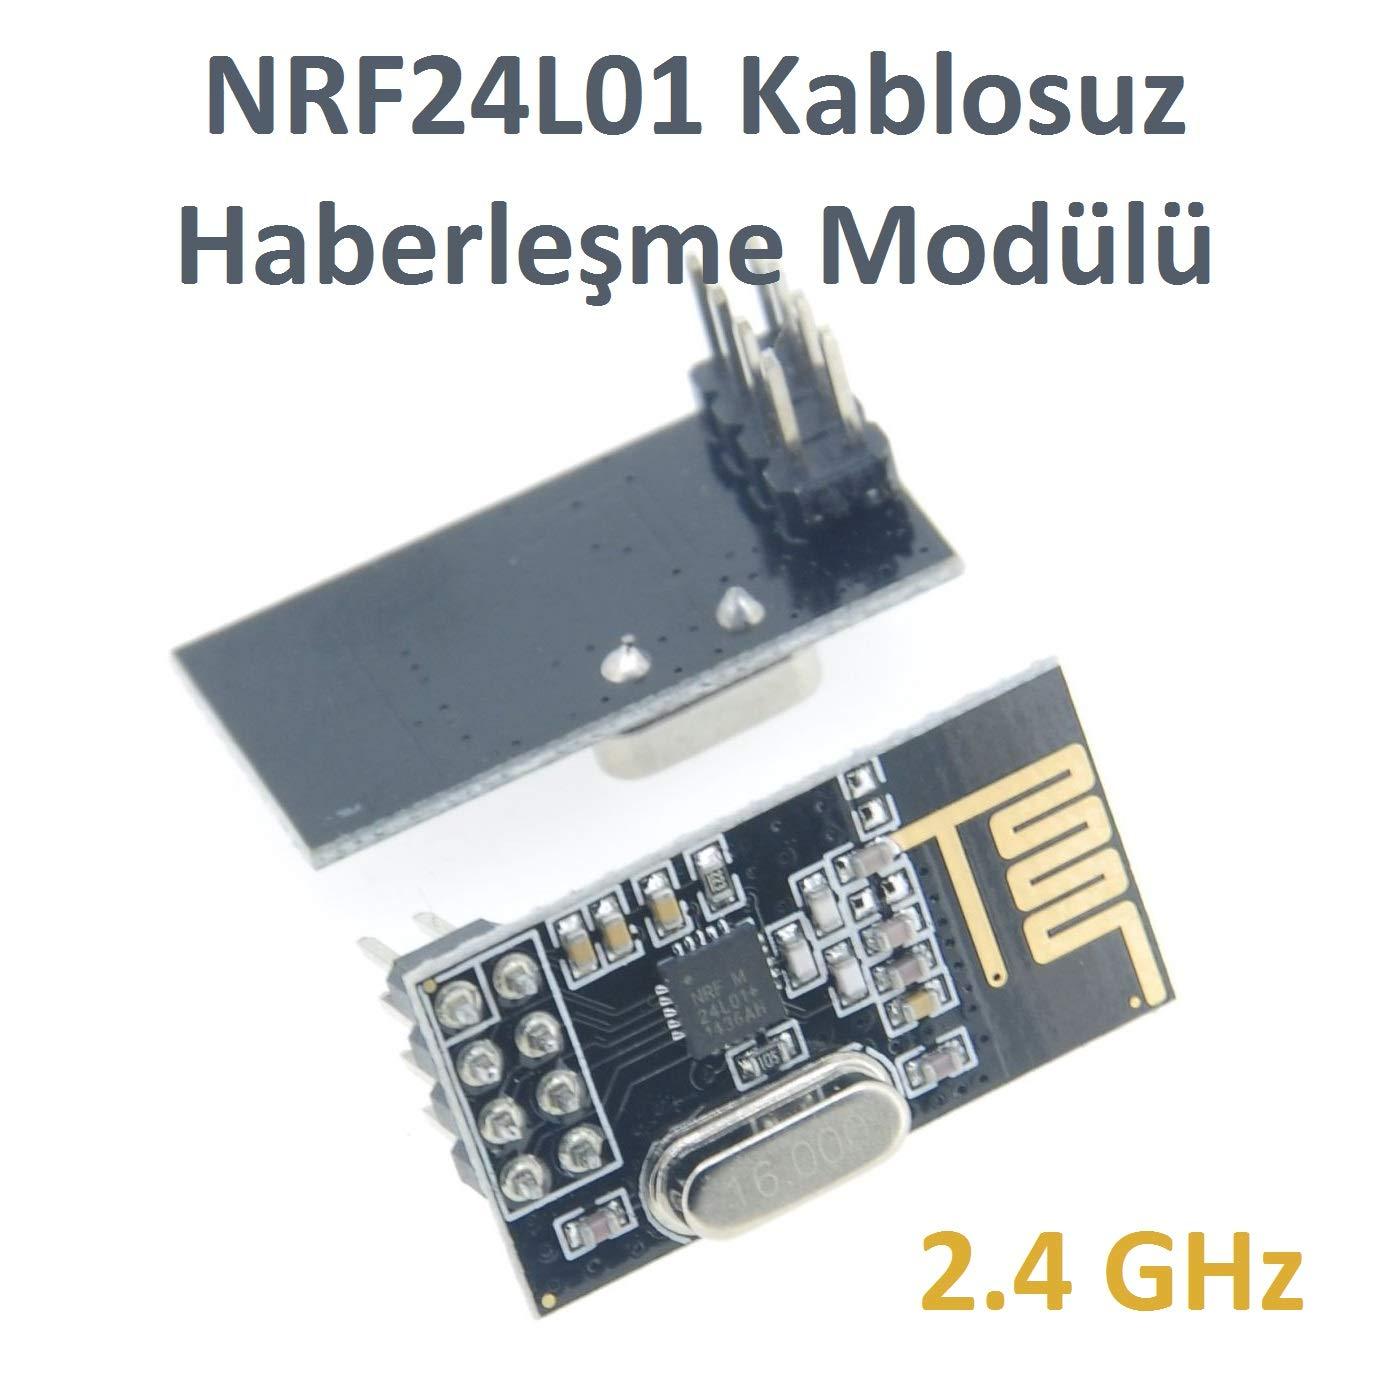 2.4GHz SI24R1 Antenna Wireless Transceiver Module For Arduino 10 pcs NRF24L01